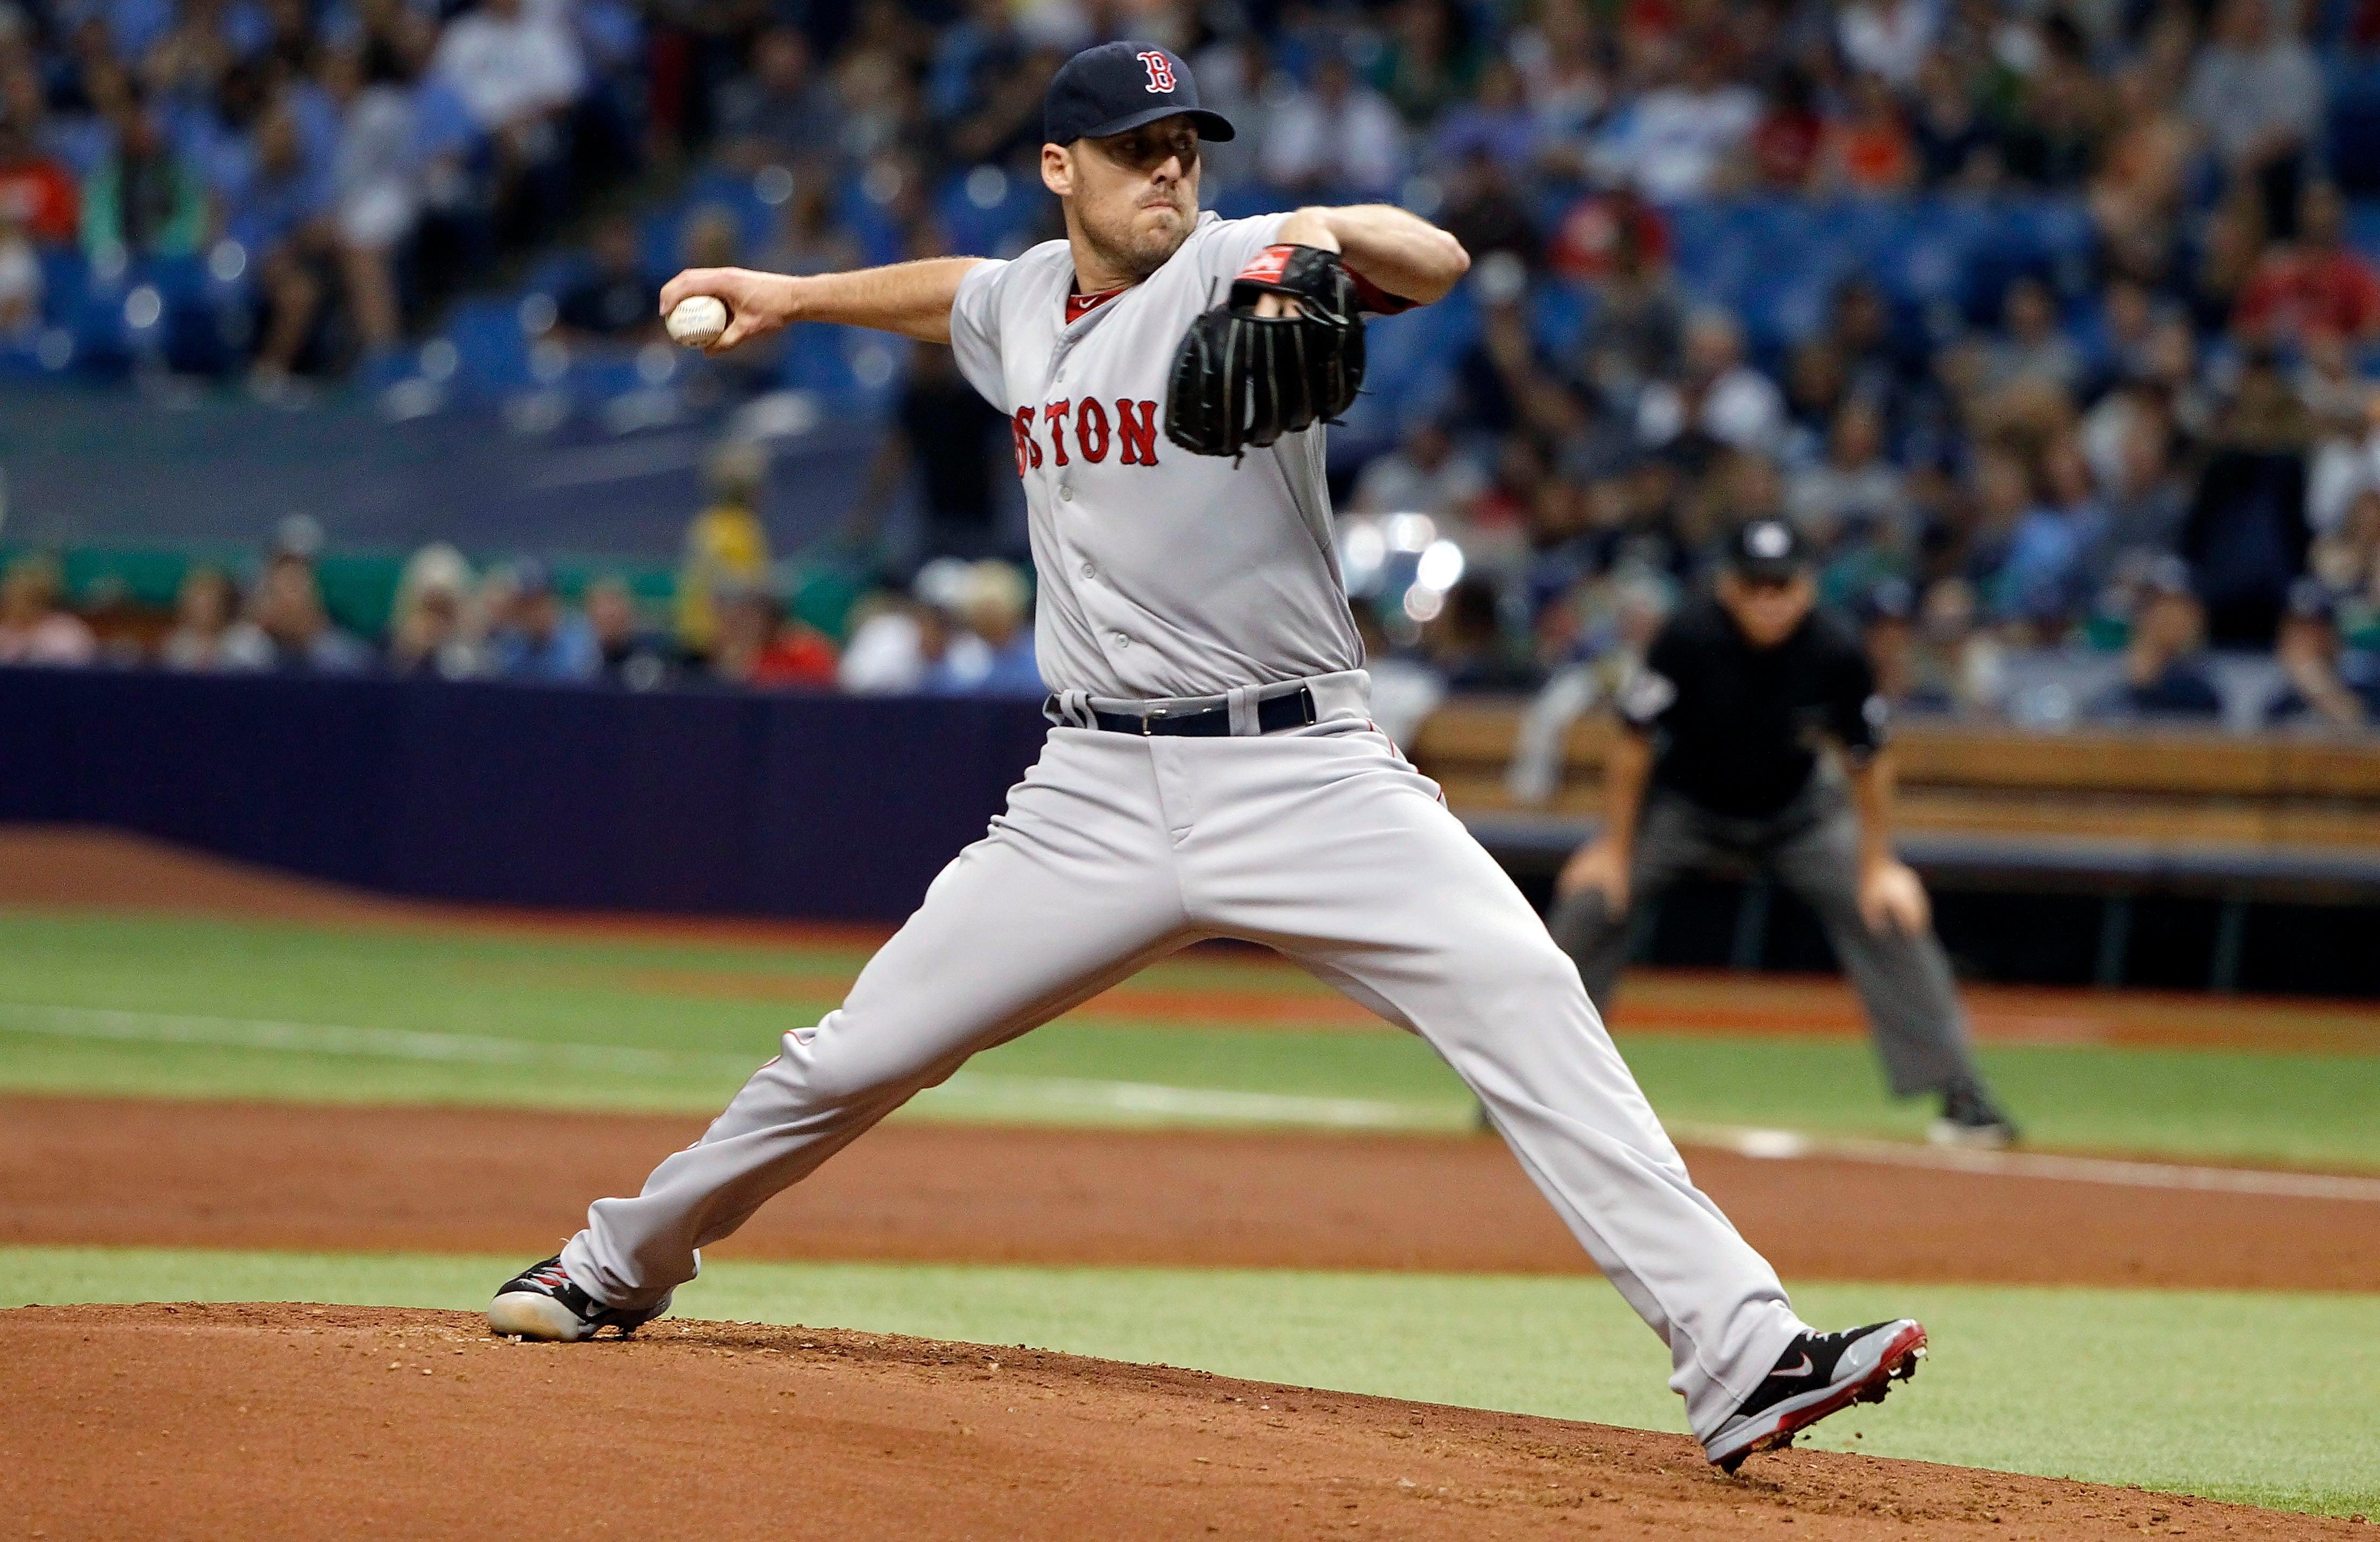 2014-05-24T000918Z_132842763_NOCID_RTRMADP_3_MLB-BOSTON-RED-SOX-AT-TAMPA-BAY-RAYS.jpg